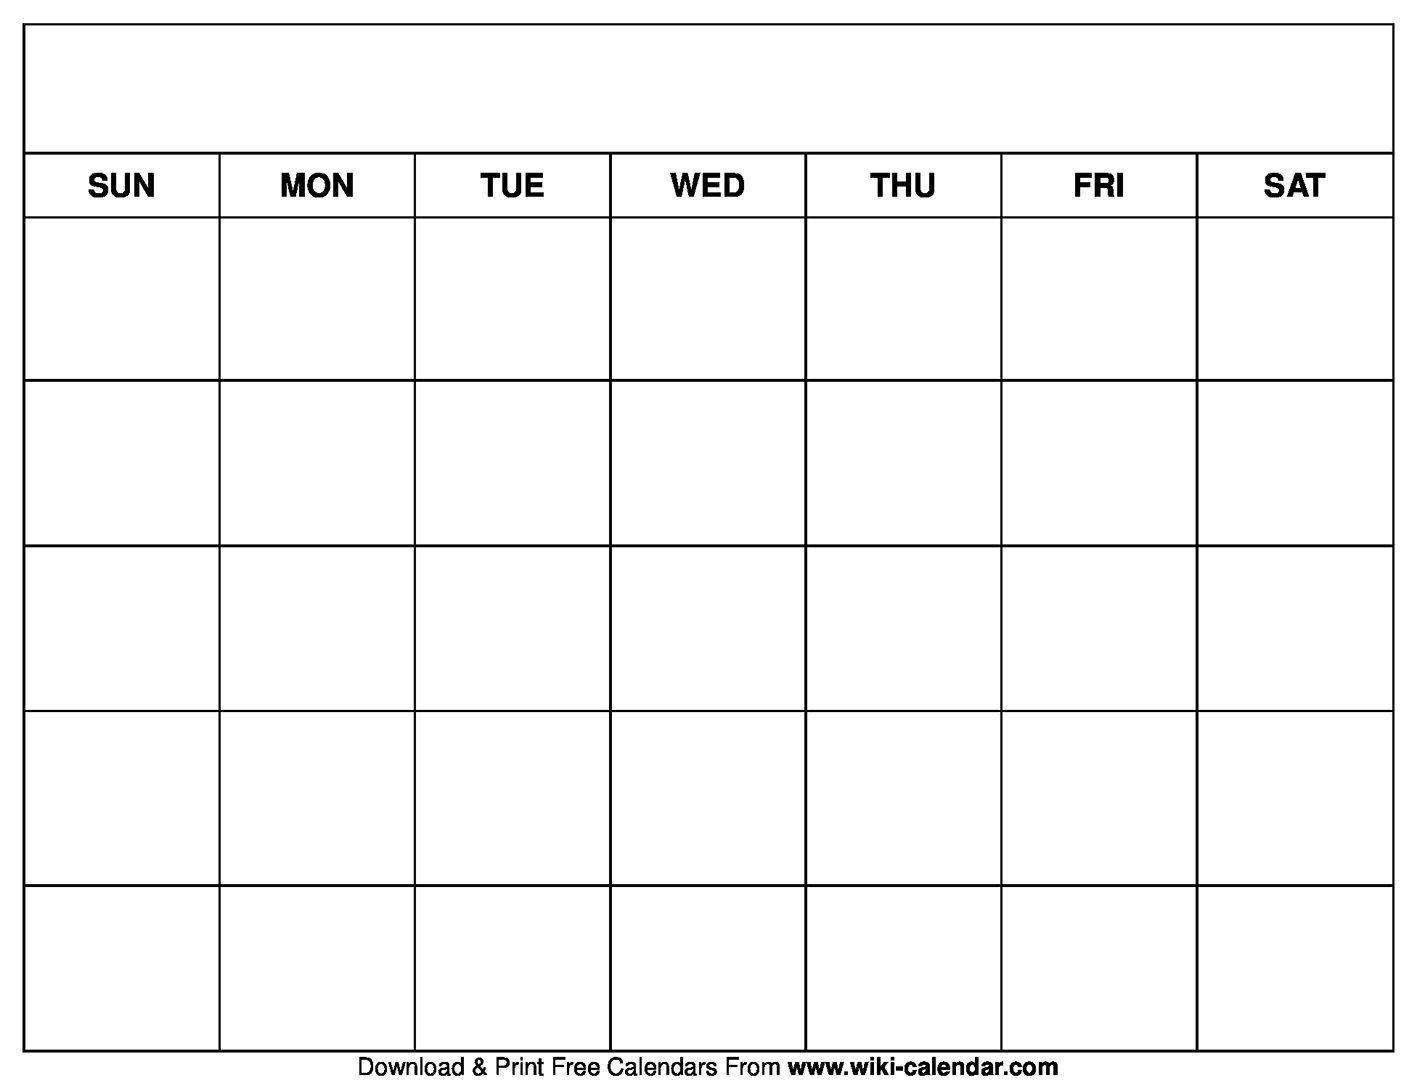 006 Fascinating Blank Calendar Template Pdf Image  Free YearlyFull